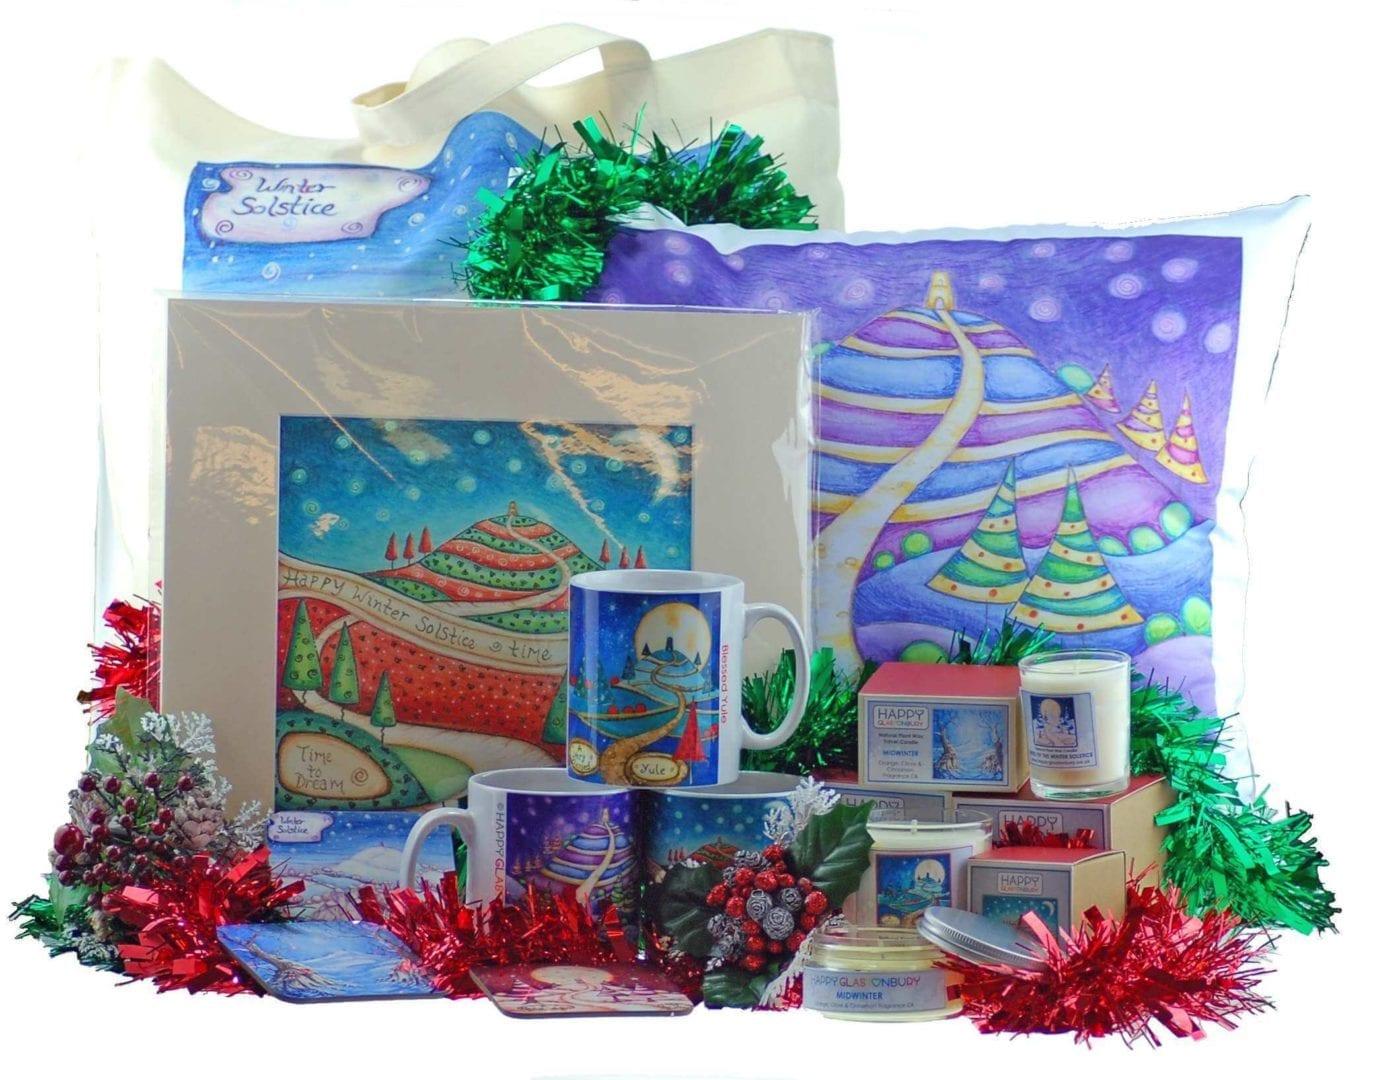 Happy Glastonbury - Christmas & Yule